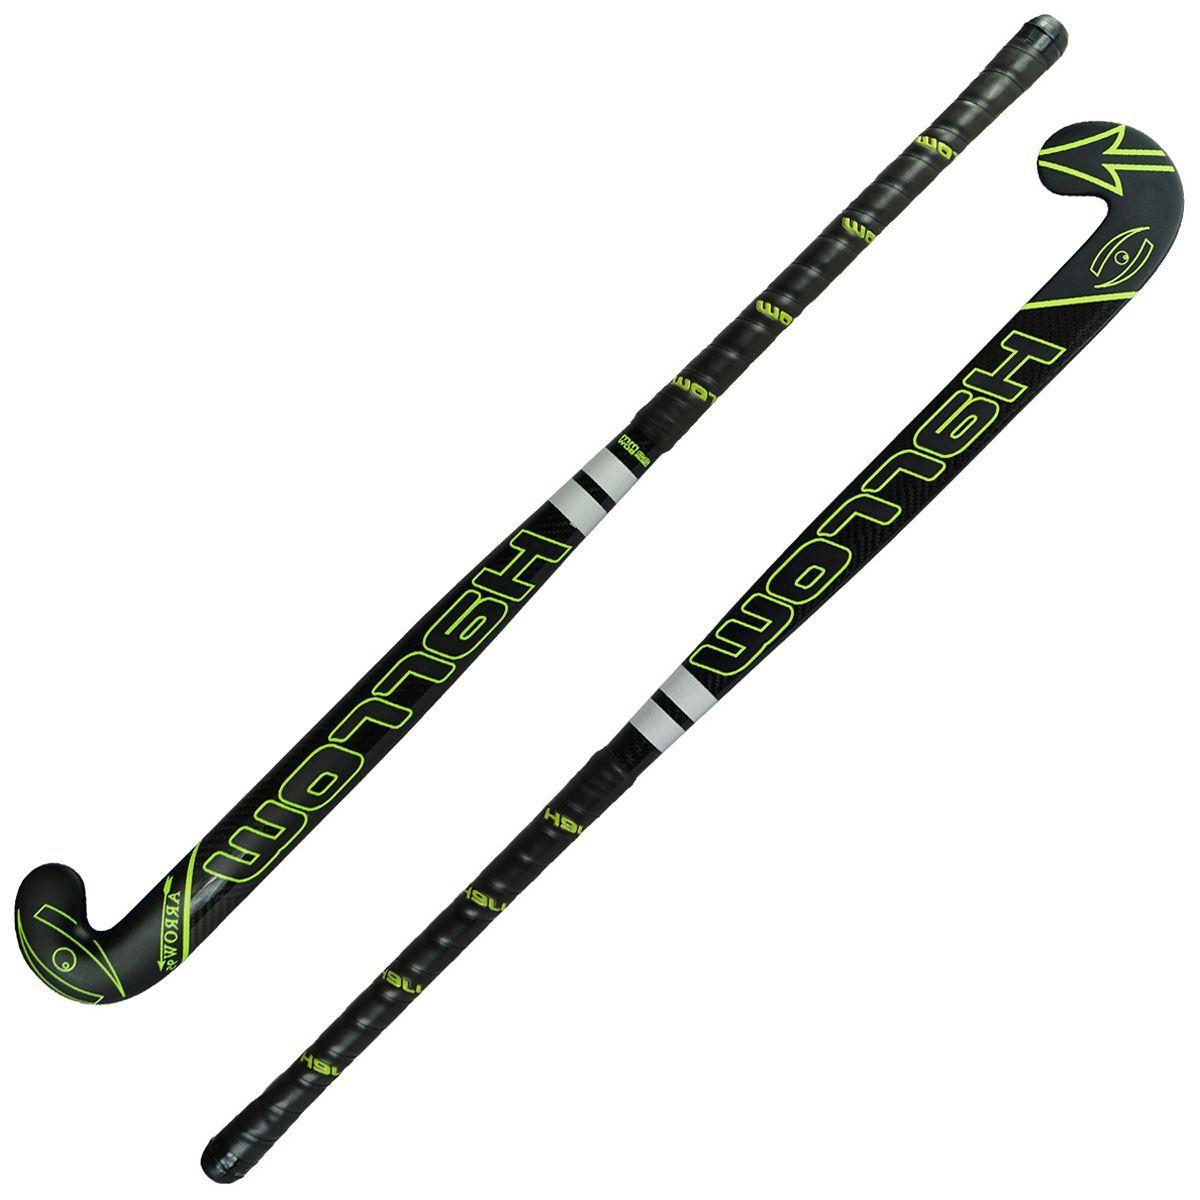 Harrow Arrow 95 Field Hockey Stick